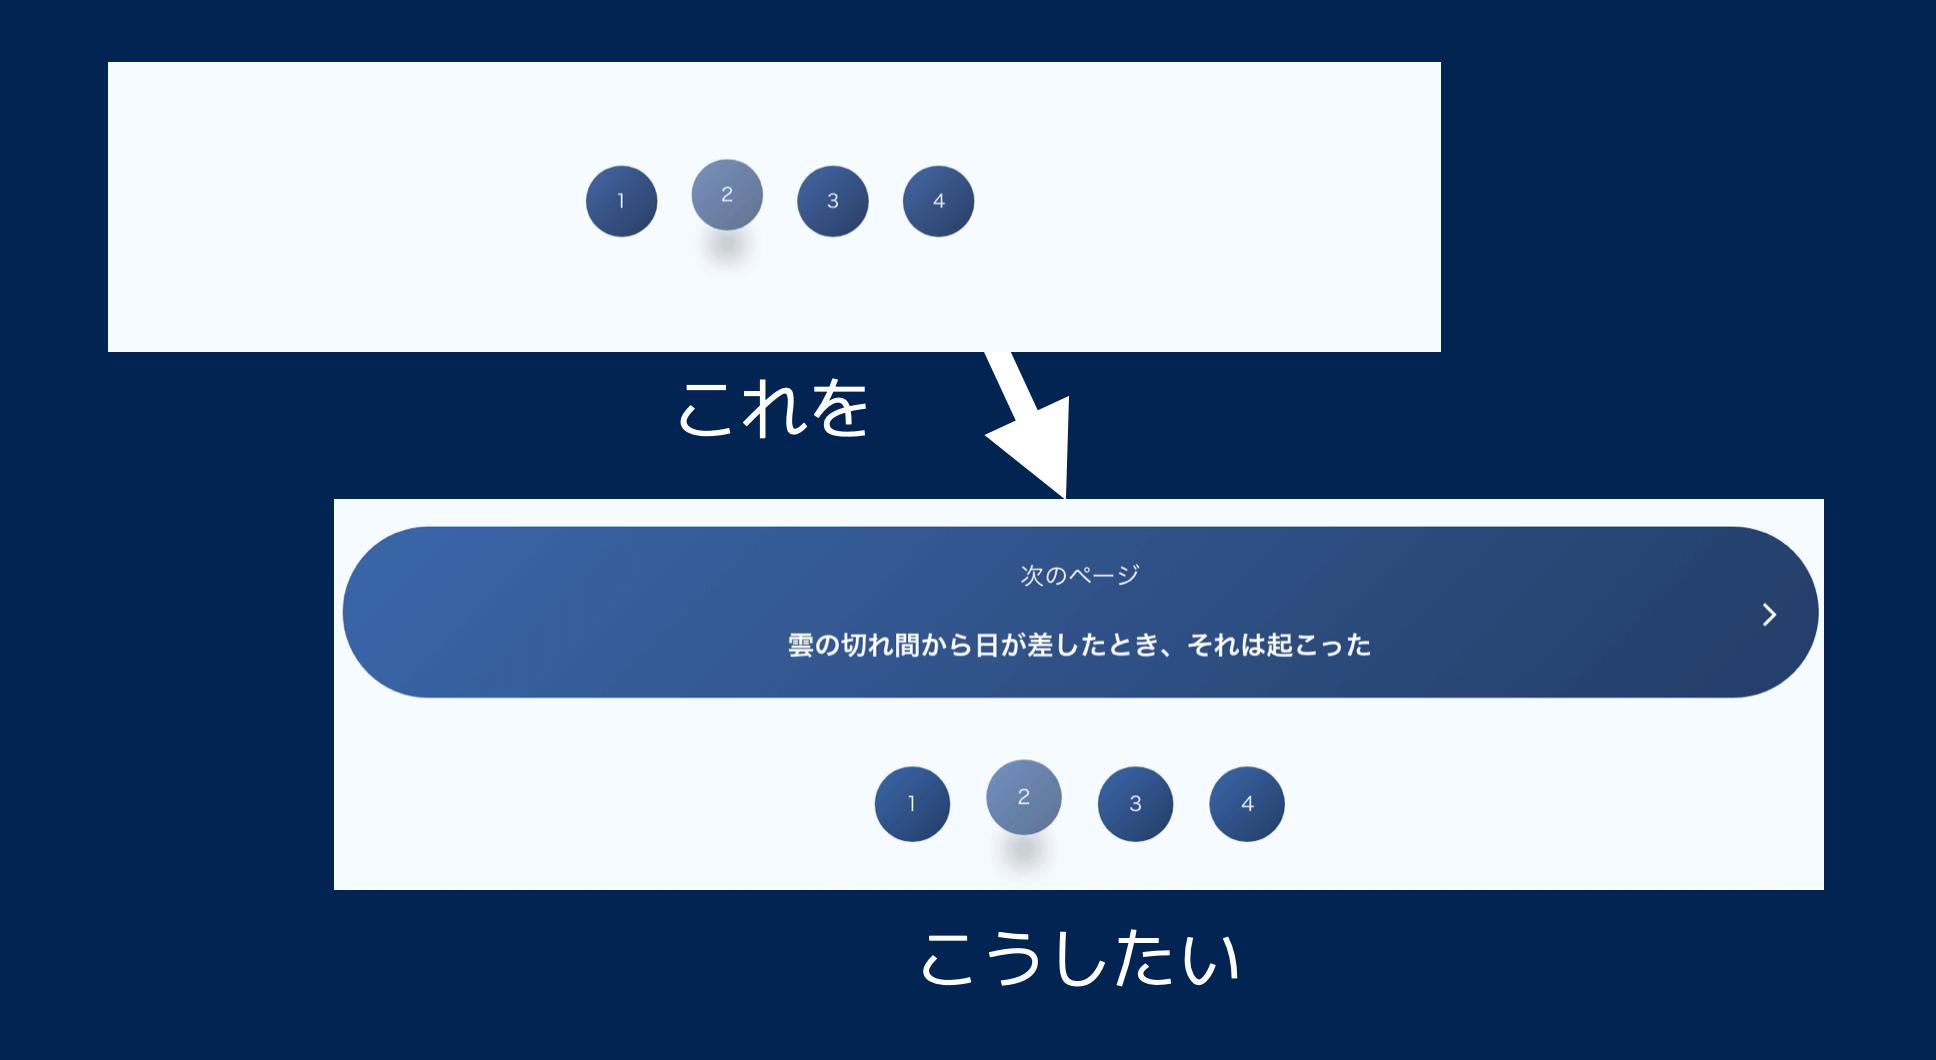 [WP]改ページの連番リンクと次ページの誘導テキストリンクを両方表示する方法